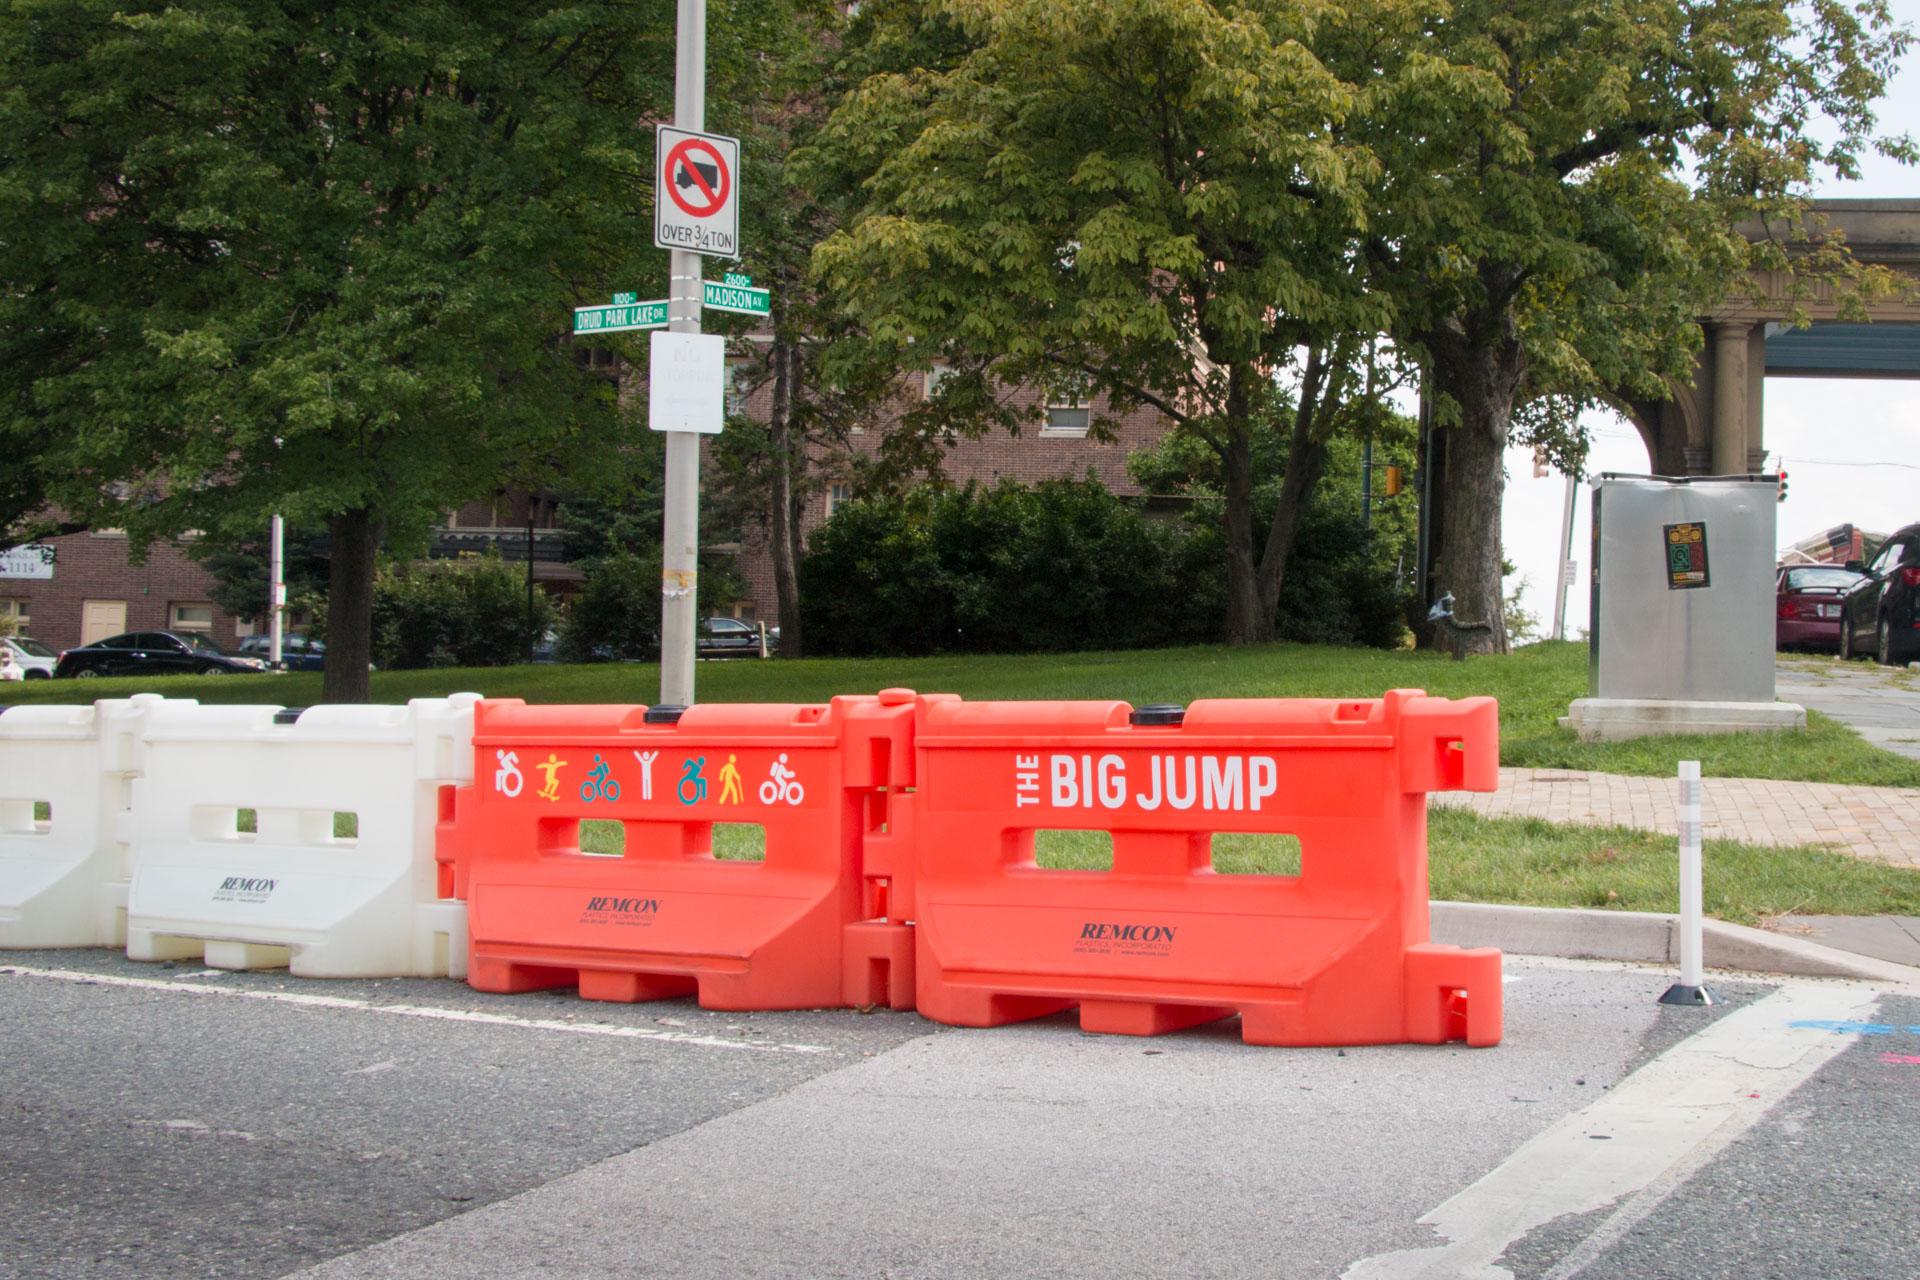 Big Jump Baltimore Wayfinding - cut vinyl branding